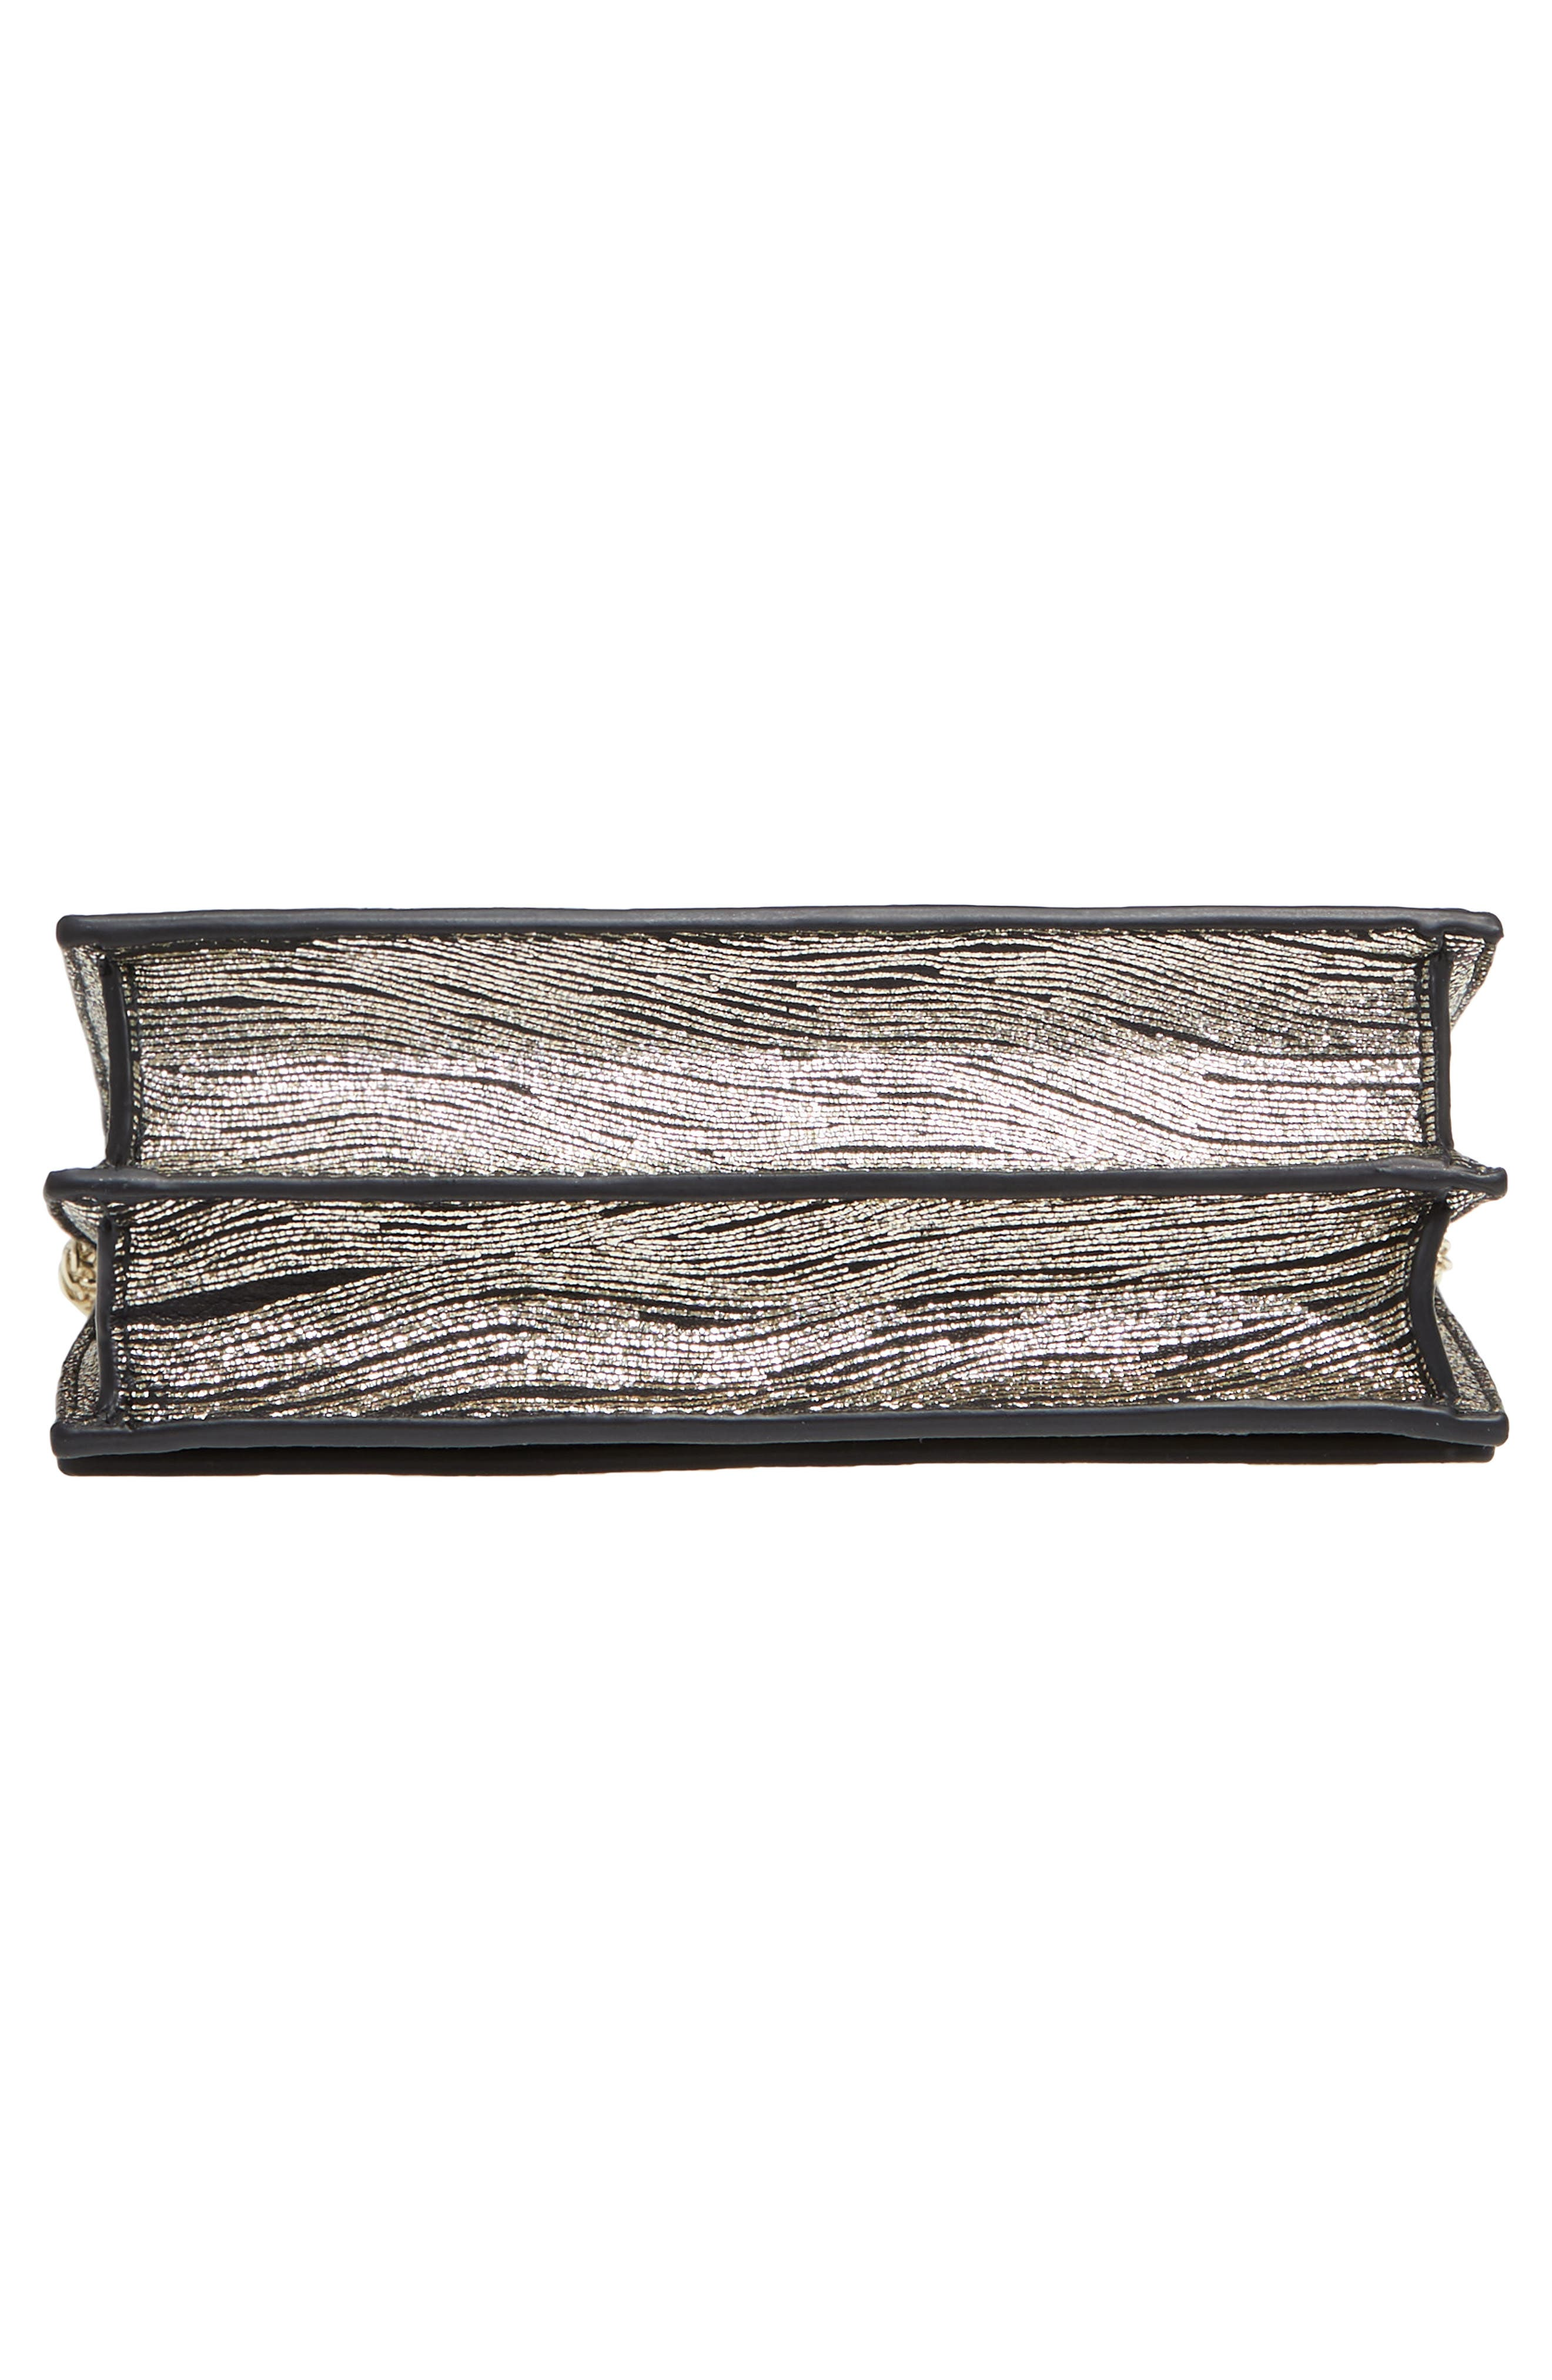 Alexia Metallic Calfskin Leather Clutch,                             Alternate thumbnail 6, color,                             710